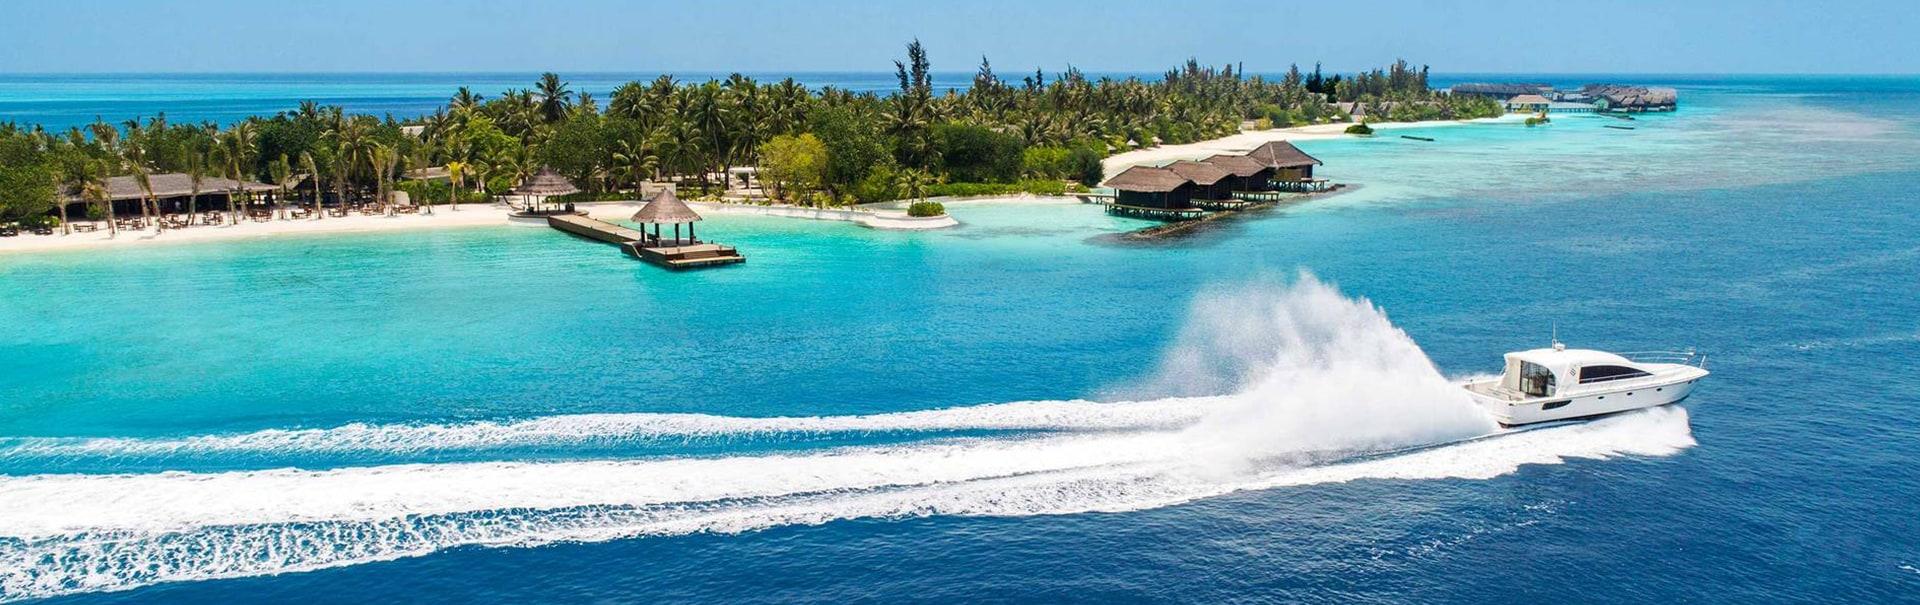 Maldives Jumeirah Vittaveli (SHML16) Banner